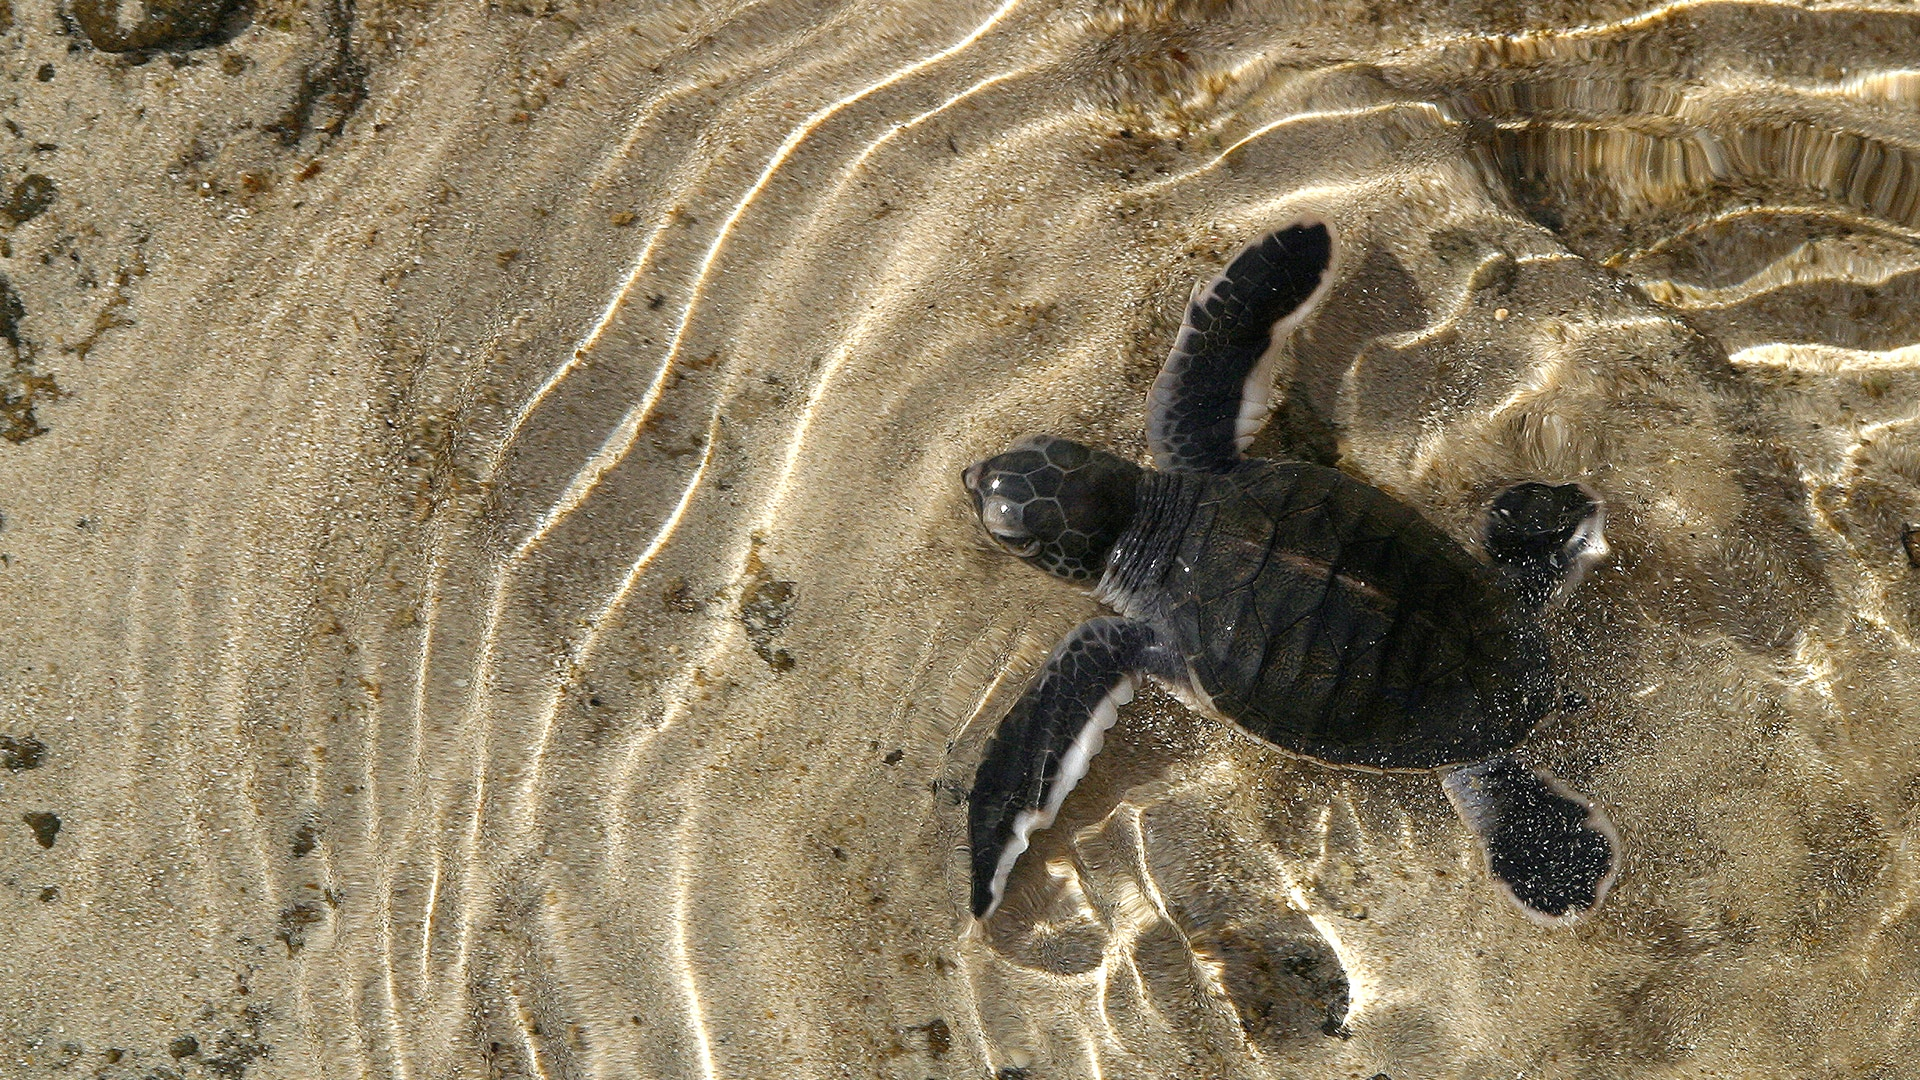 Baby hawksbill turtle swimming